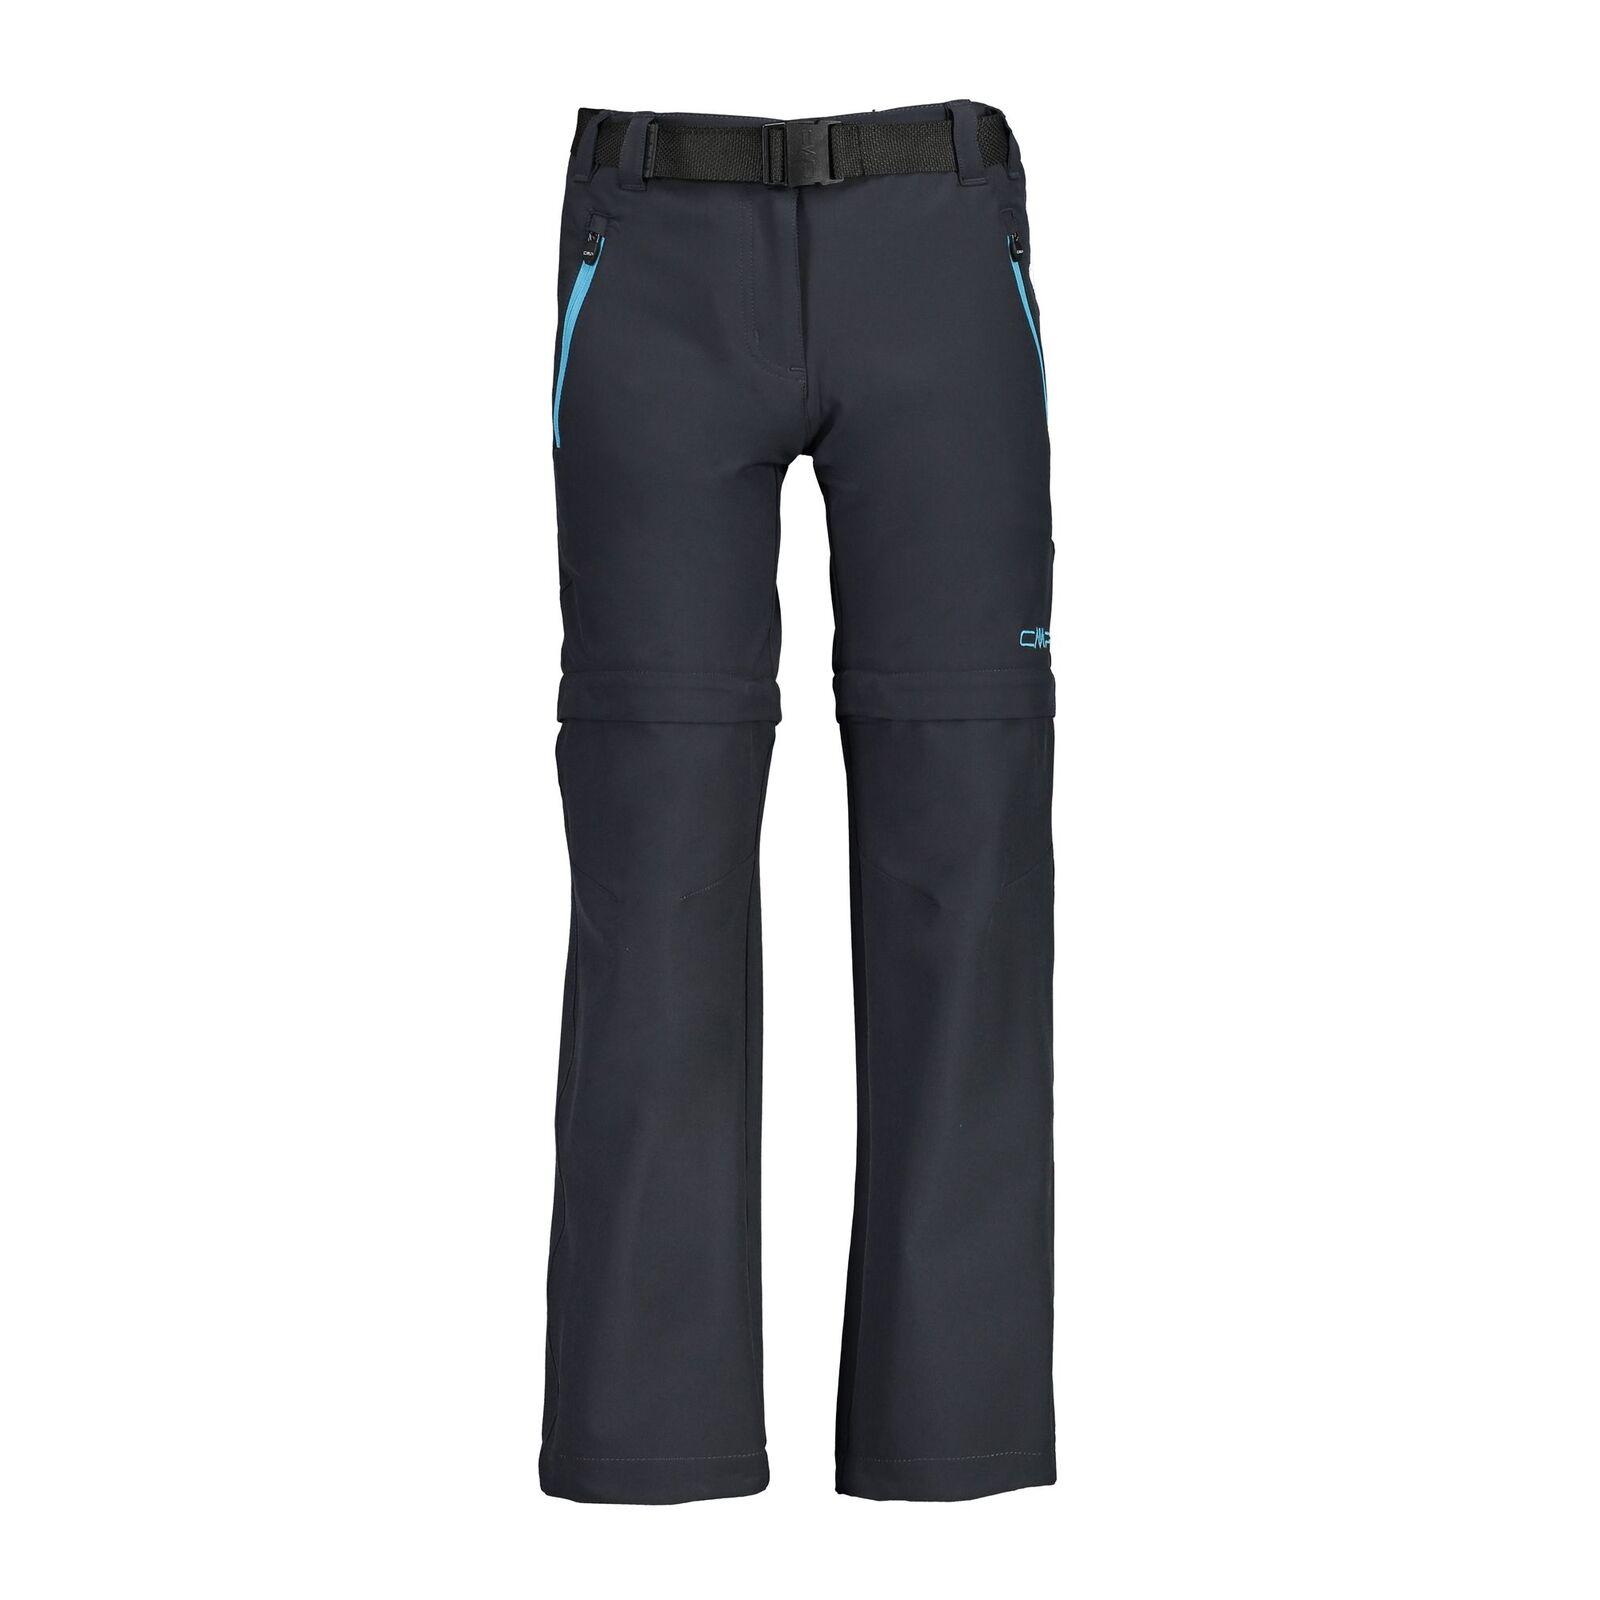 CMP Functional Pants Hiking Pants Girl Pant Zip off Grey